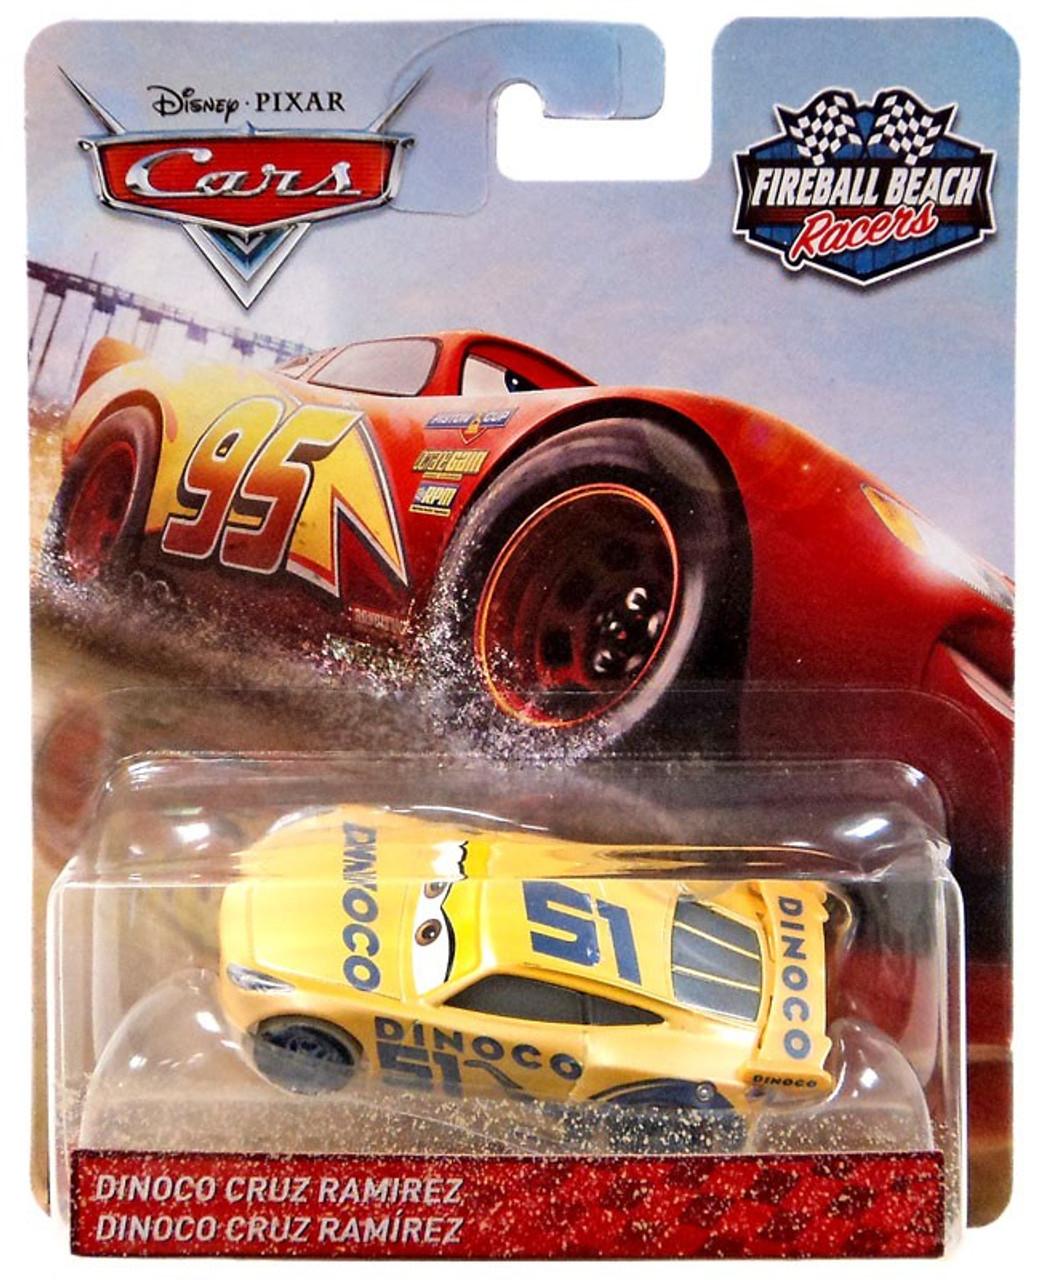 Disney Pixar Cars Cars 3 Fireball Beach Racers Dinoco Cruz Ramirez